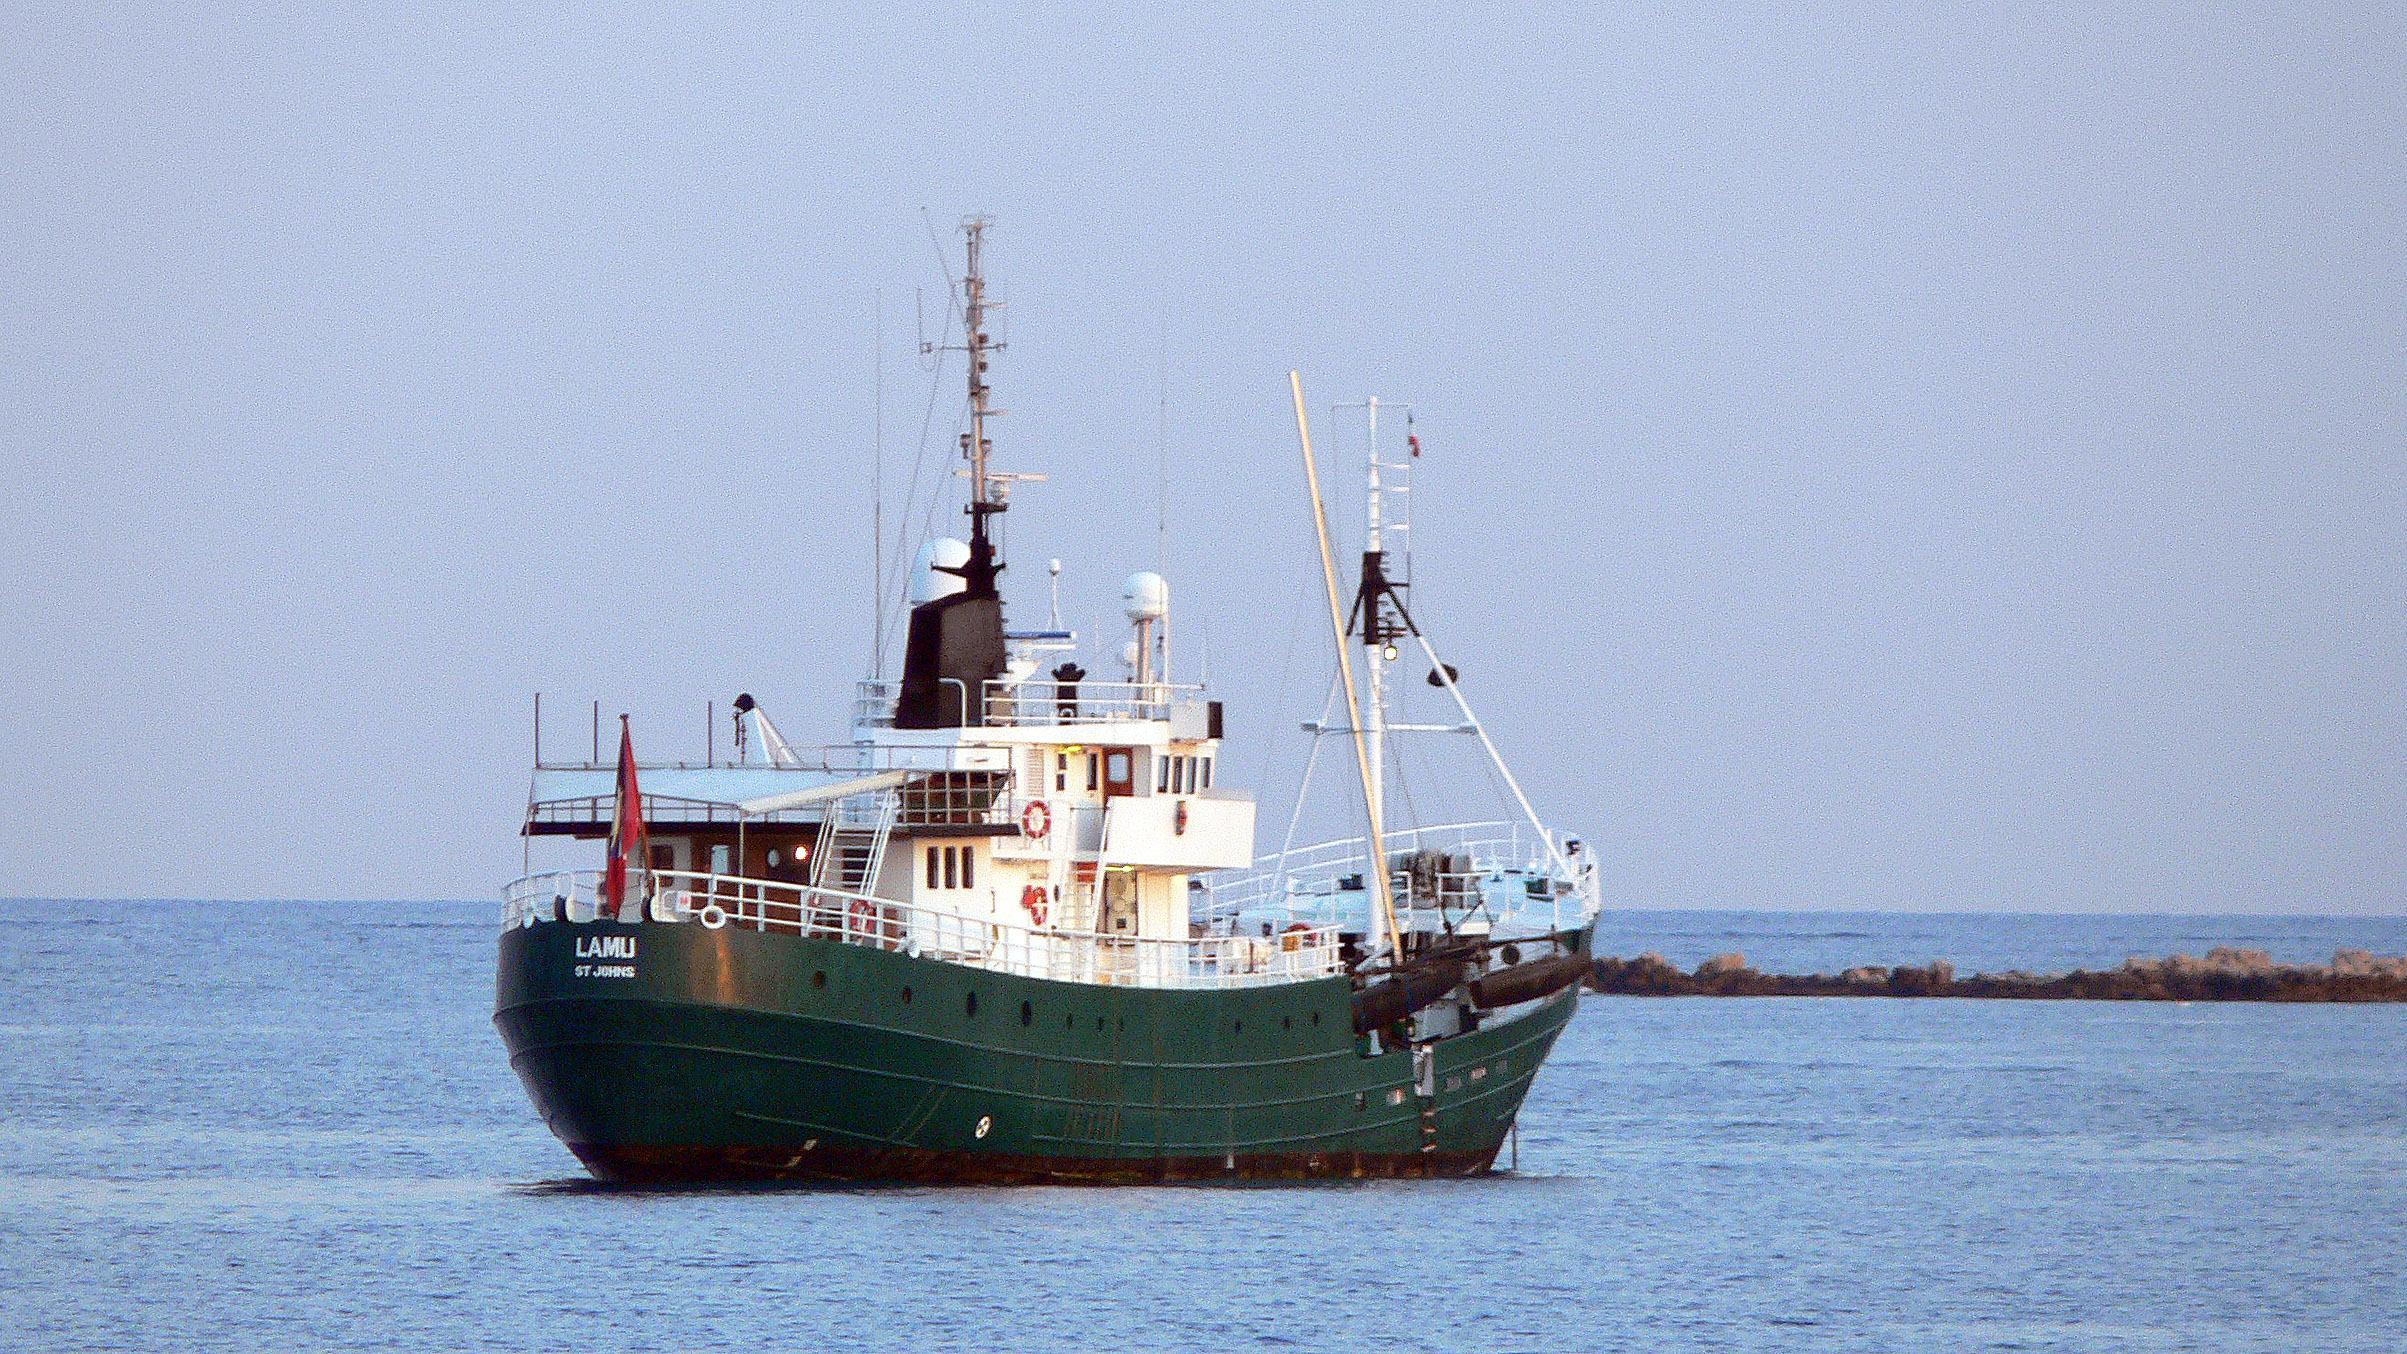 krebs-research-explorer-yacht-lewis-1953-51m-stern